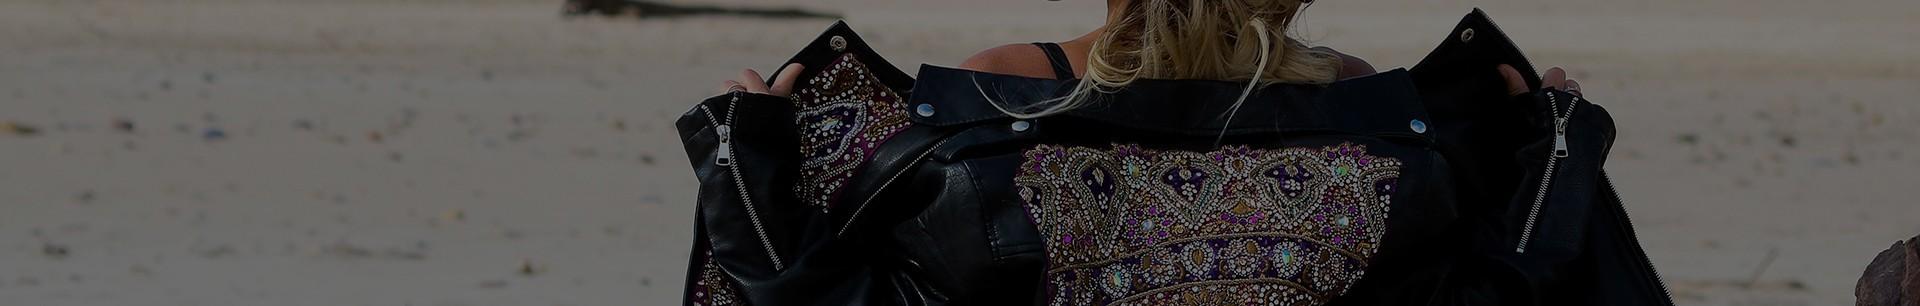 Cazadoras vintage bordadas | Lakshmisoul